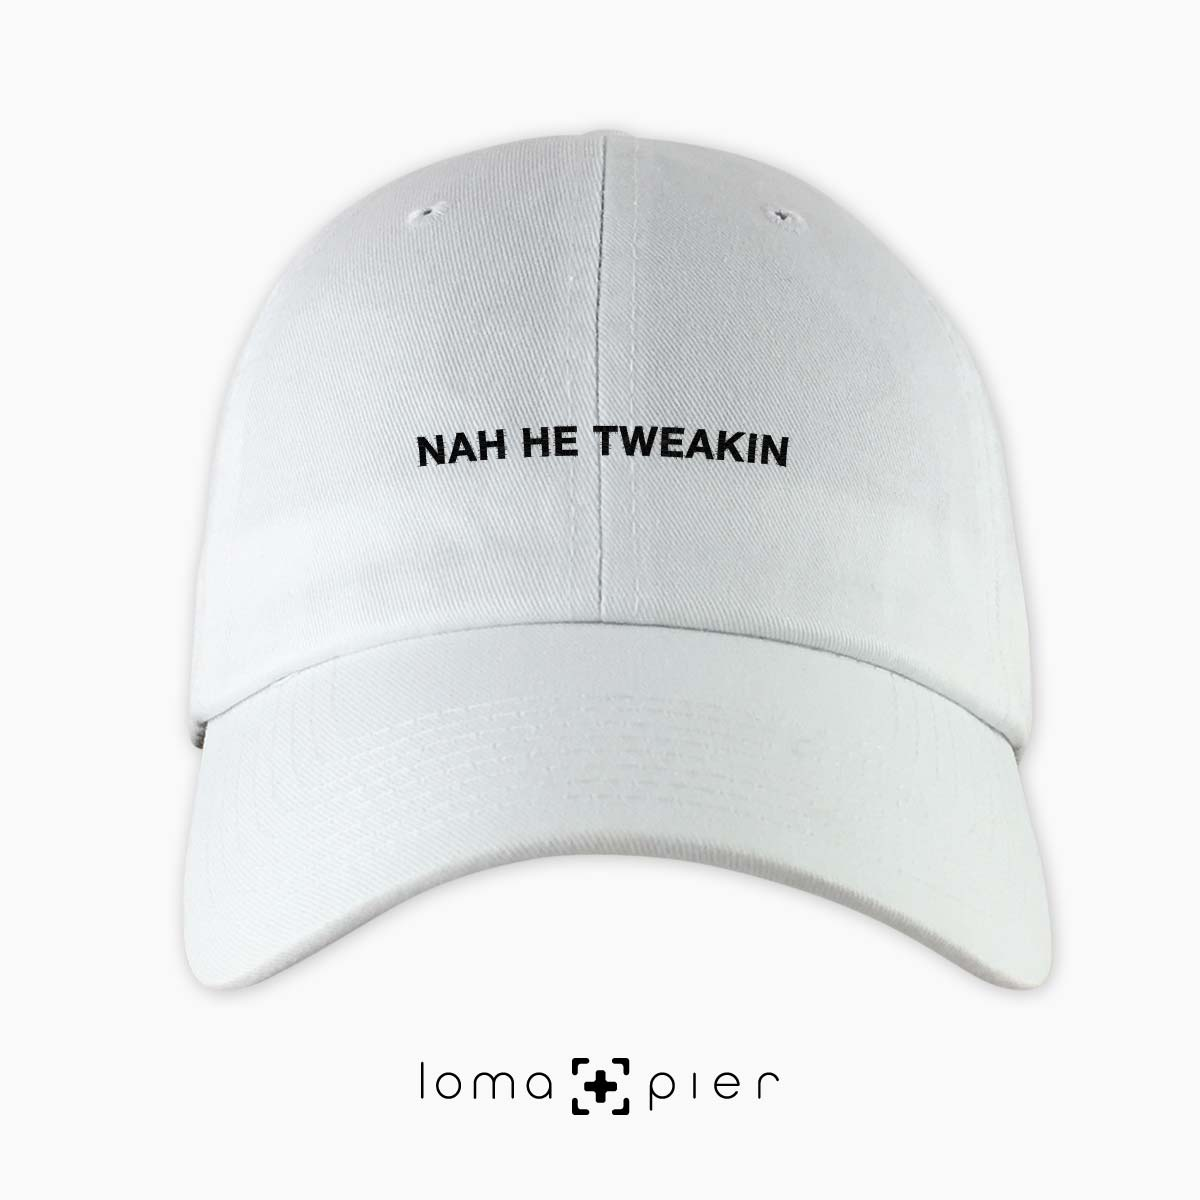 NAH HE TWEAKIN dad hat by loma+pier hat store